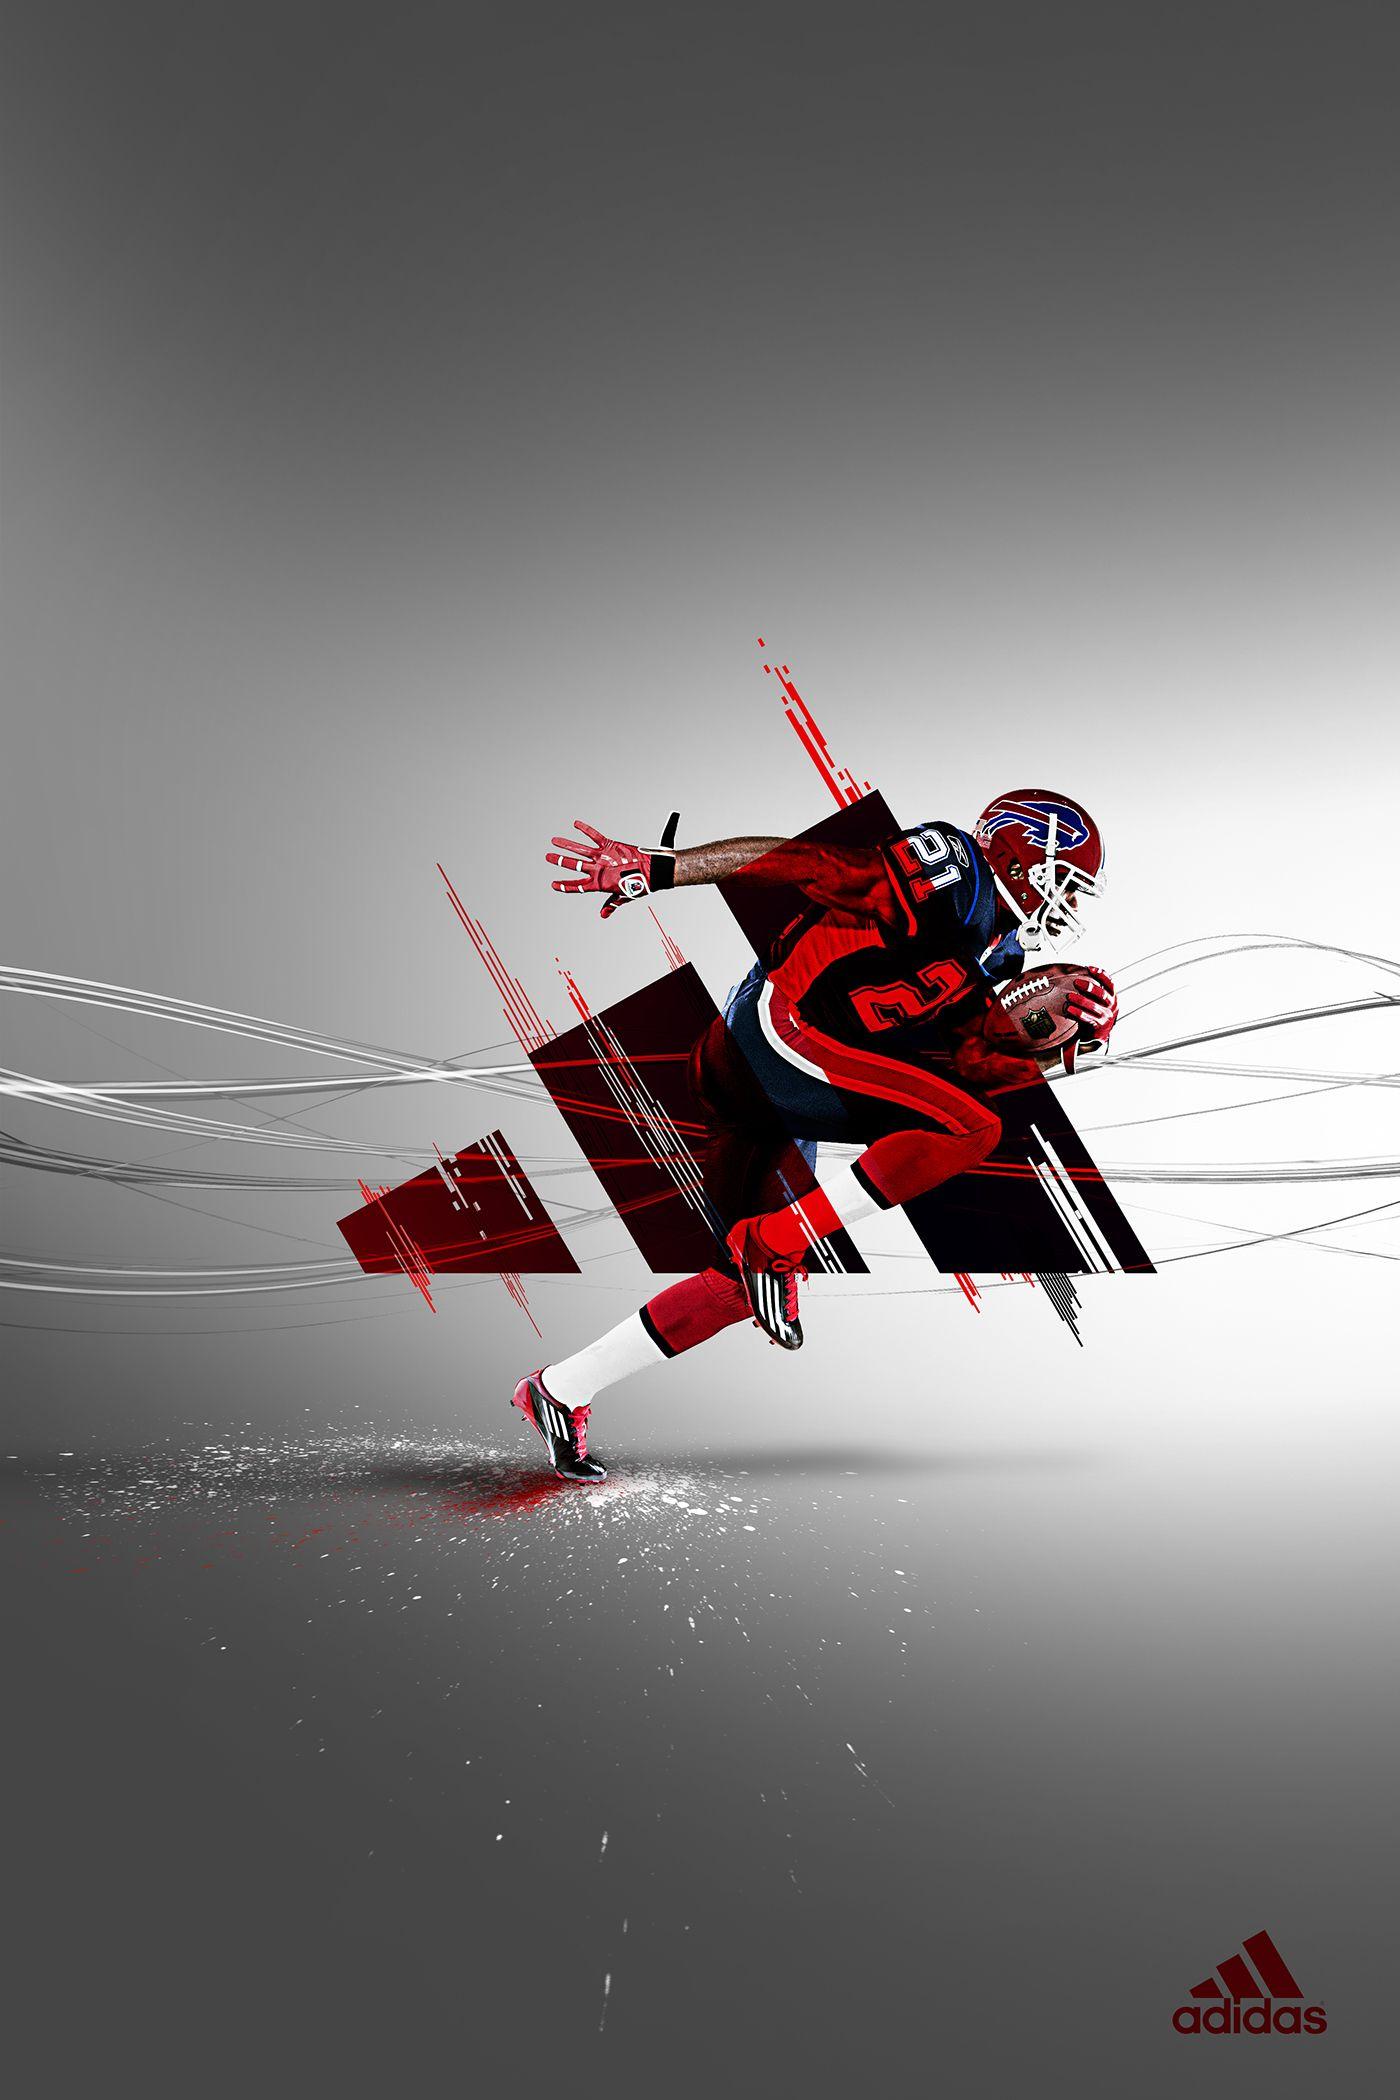 Adidas | Advertisement on Behance | Poster | Sports ...